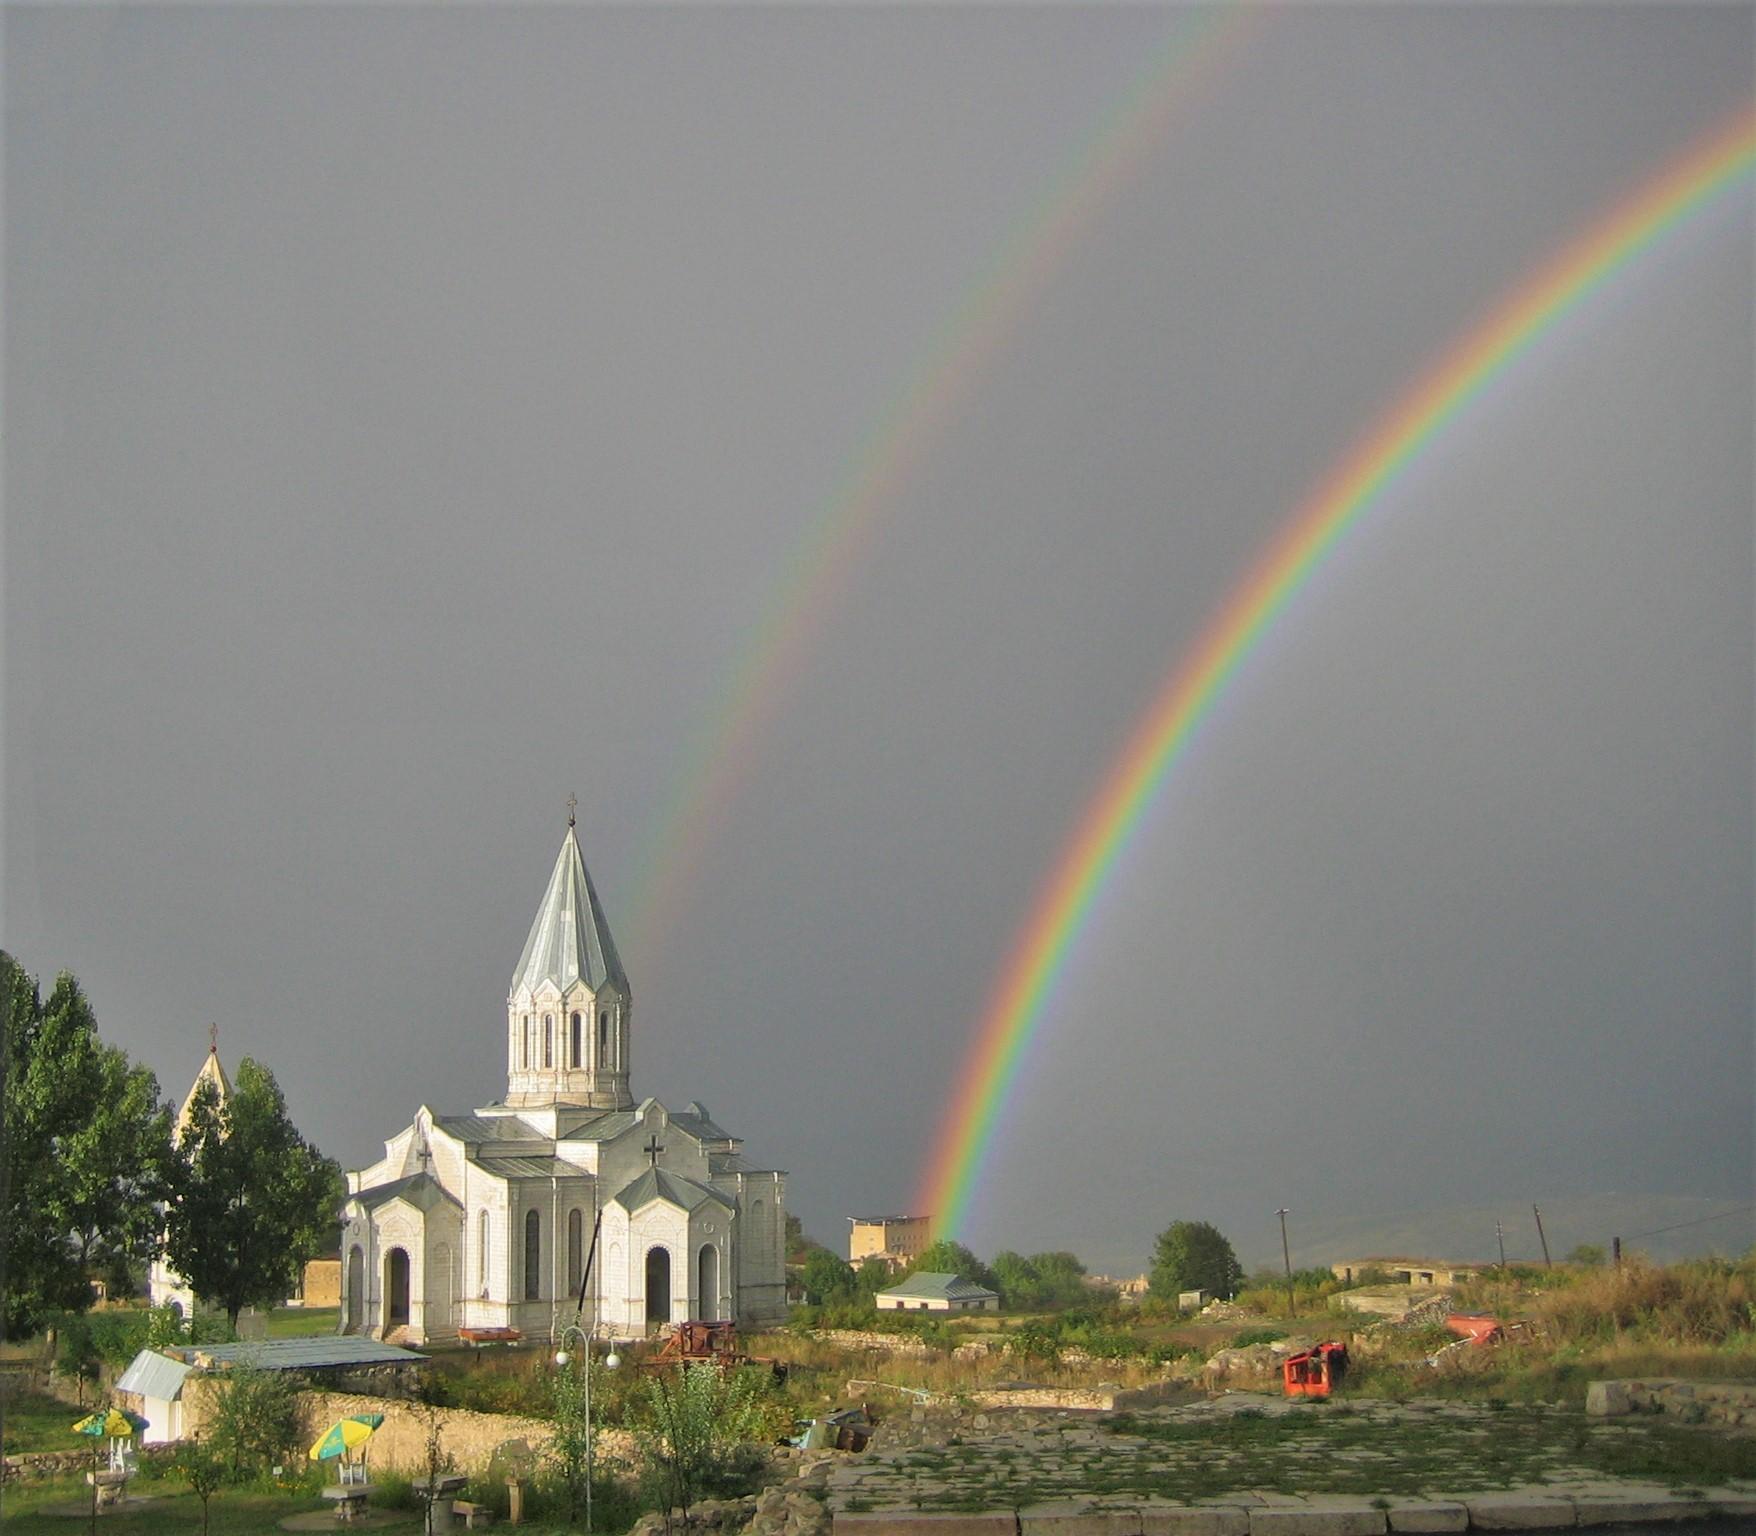 https://upload.wikimedia.org/wikipedia/commons/d/d9/Ghazanchetsots_Double_Rainbow.jpg